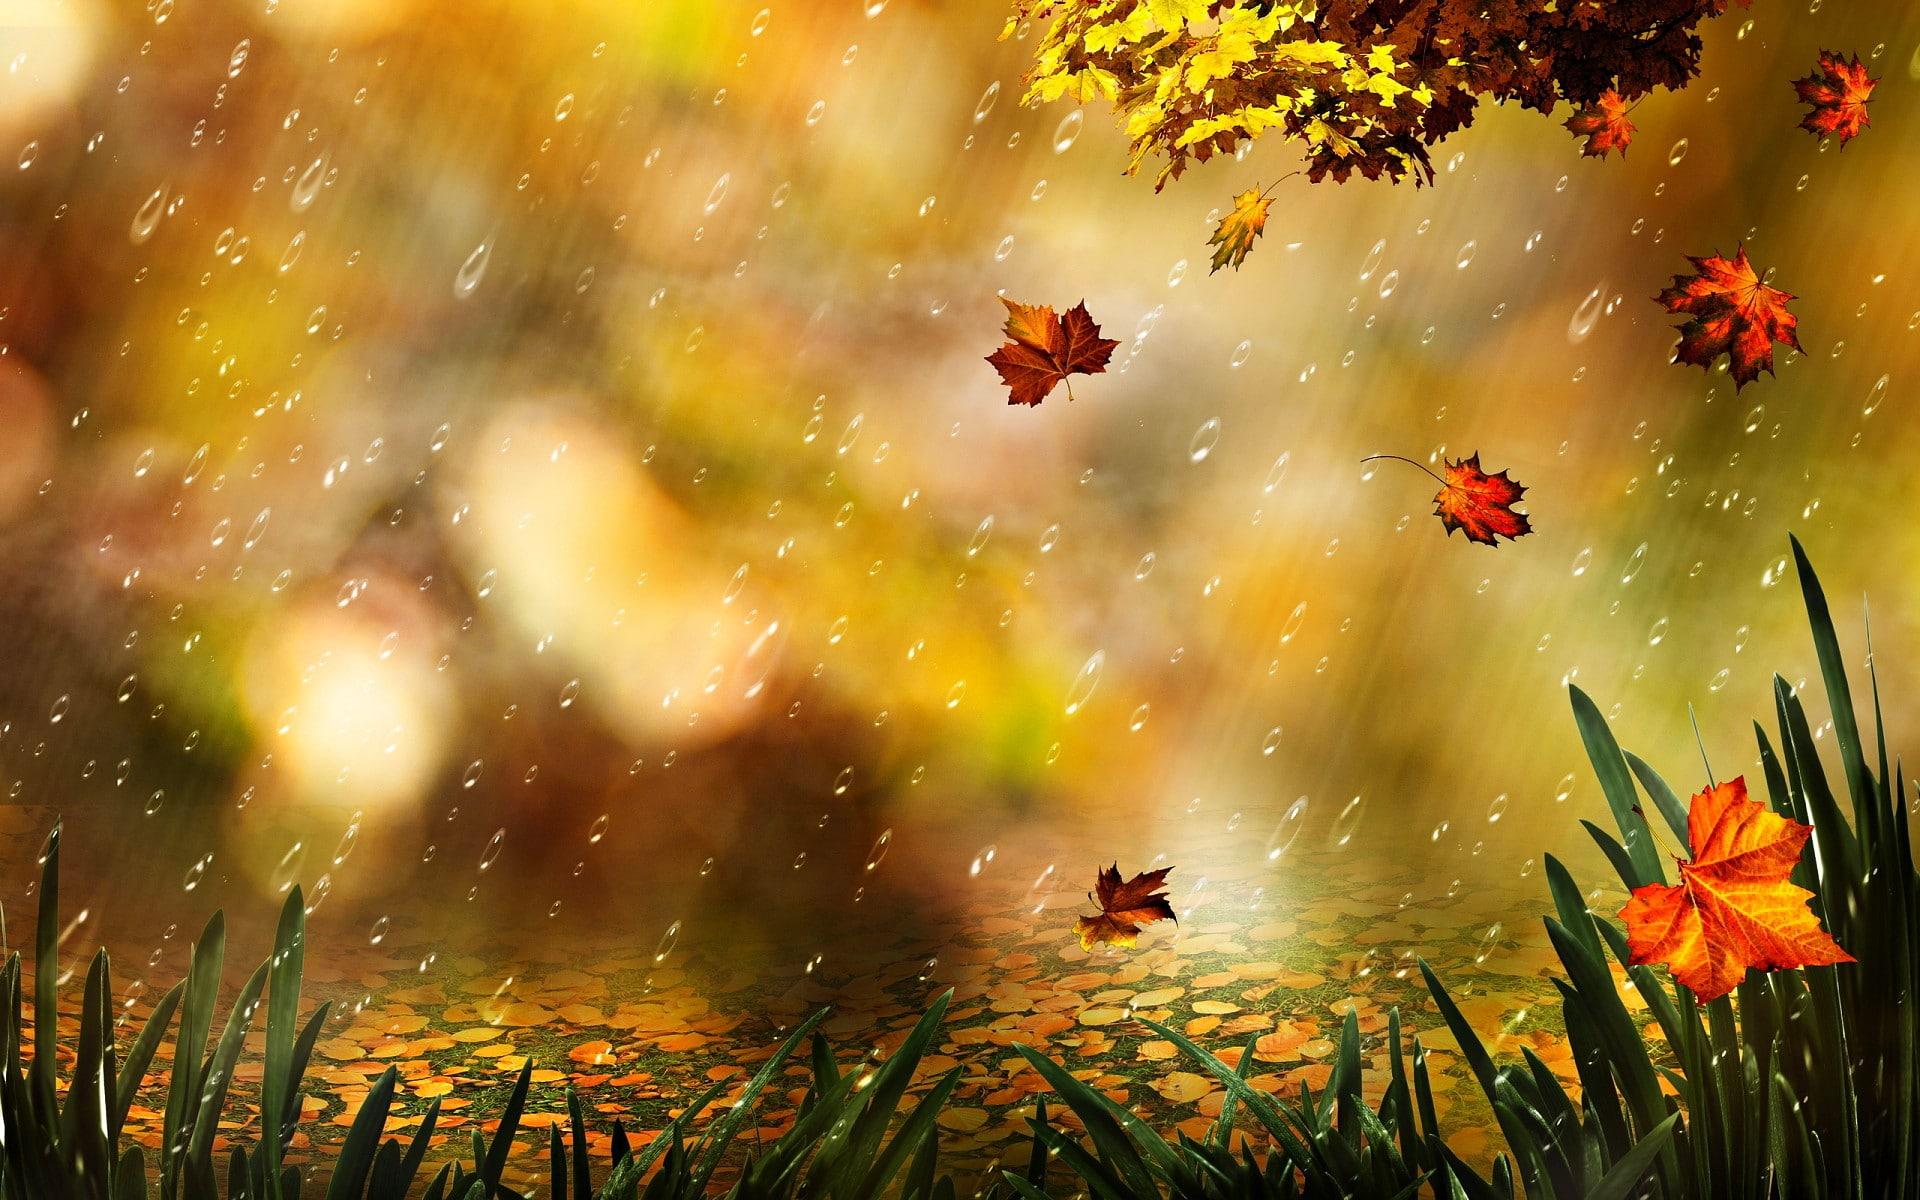 aesthetic fall wallpaper